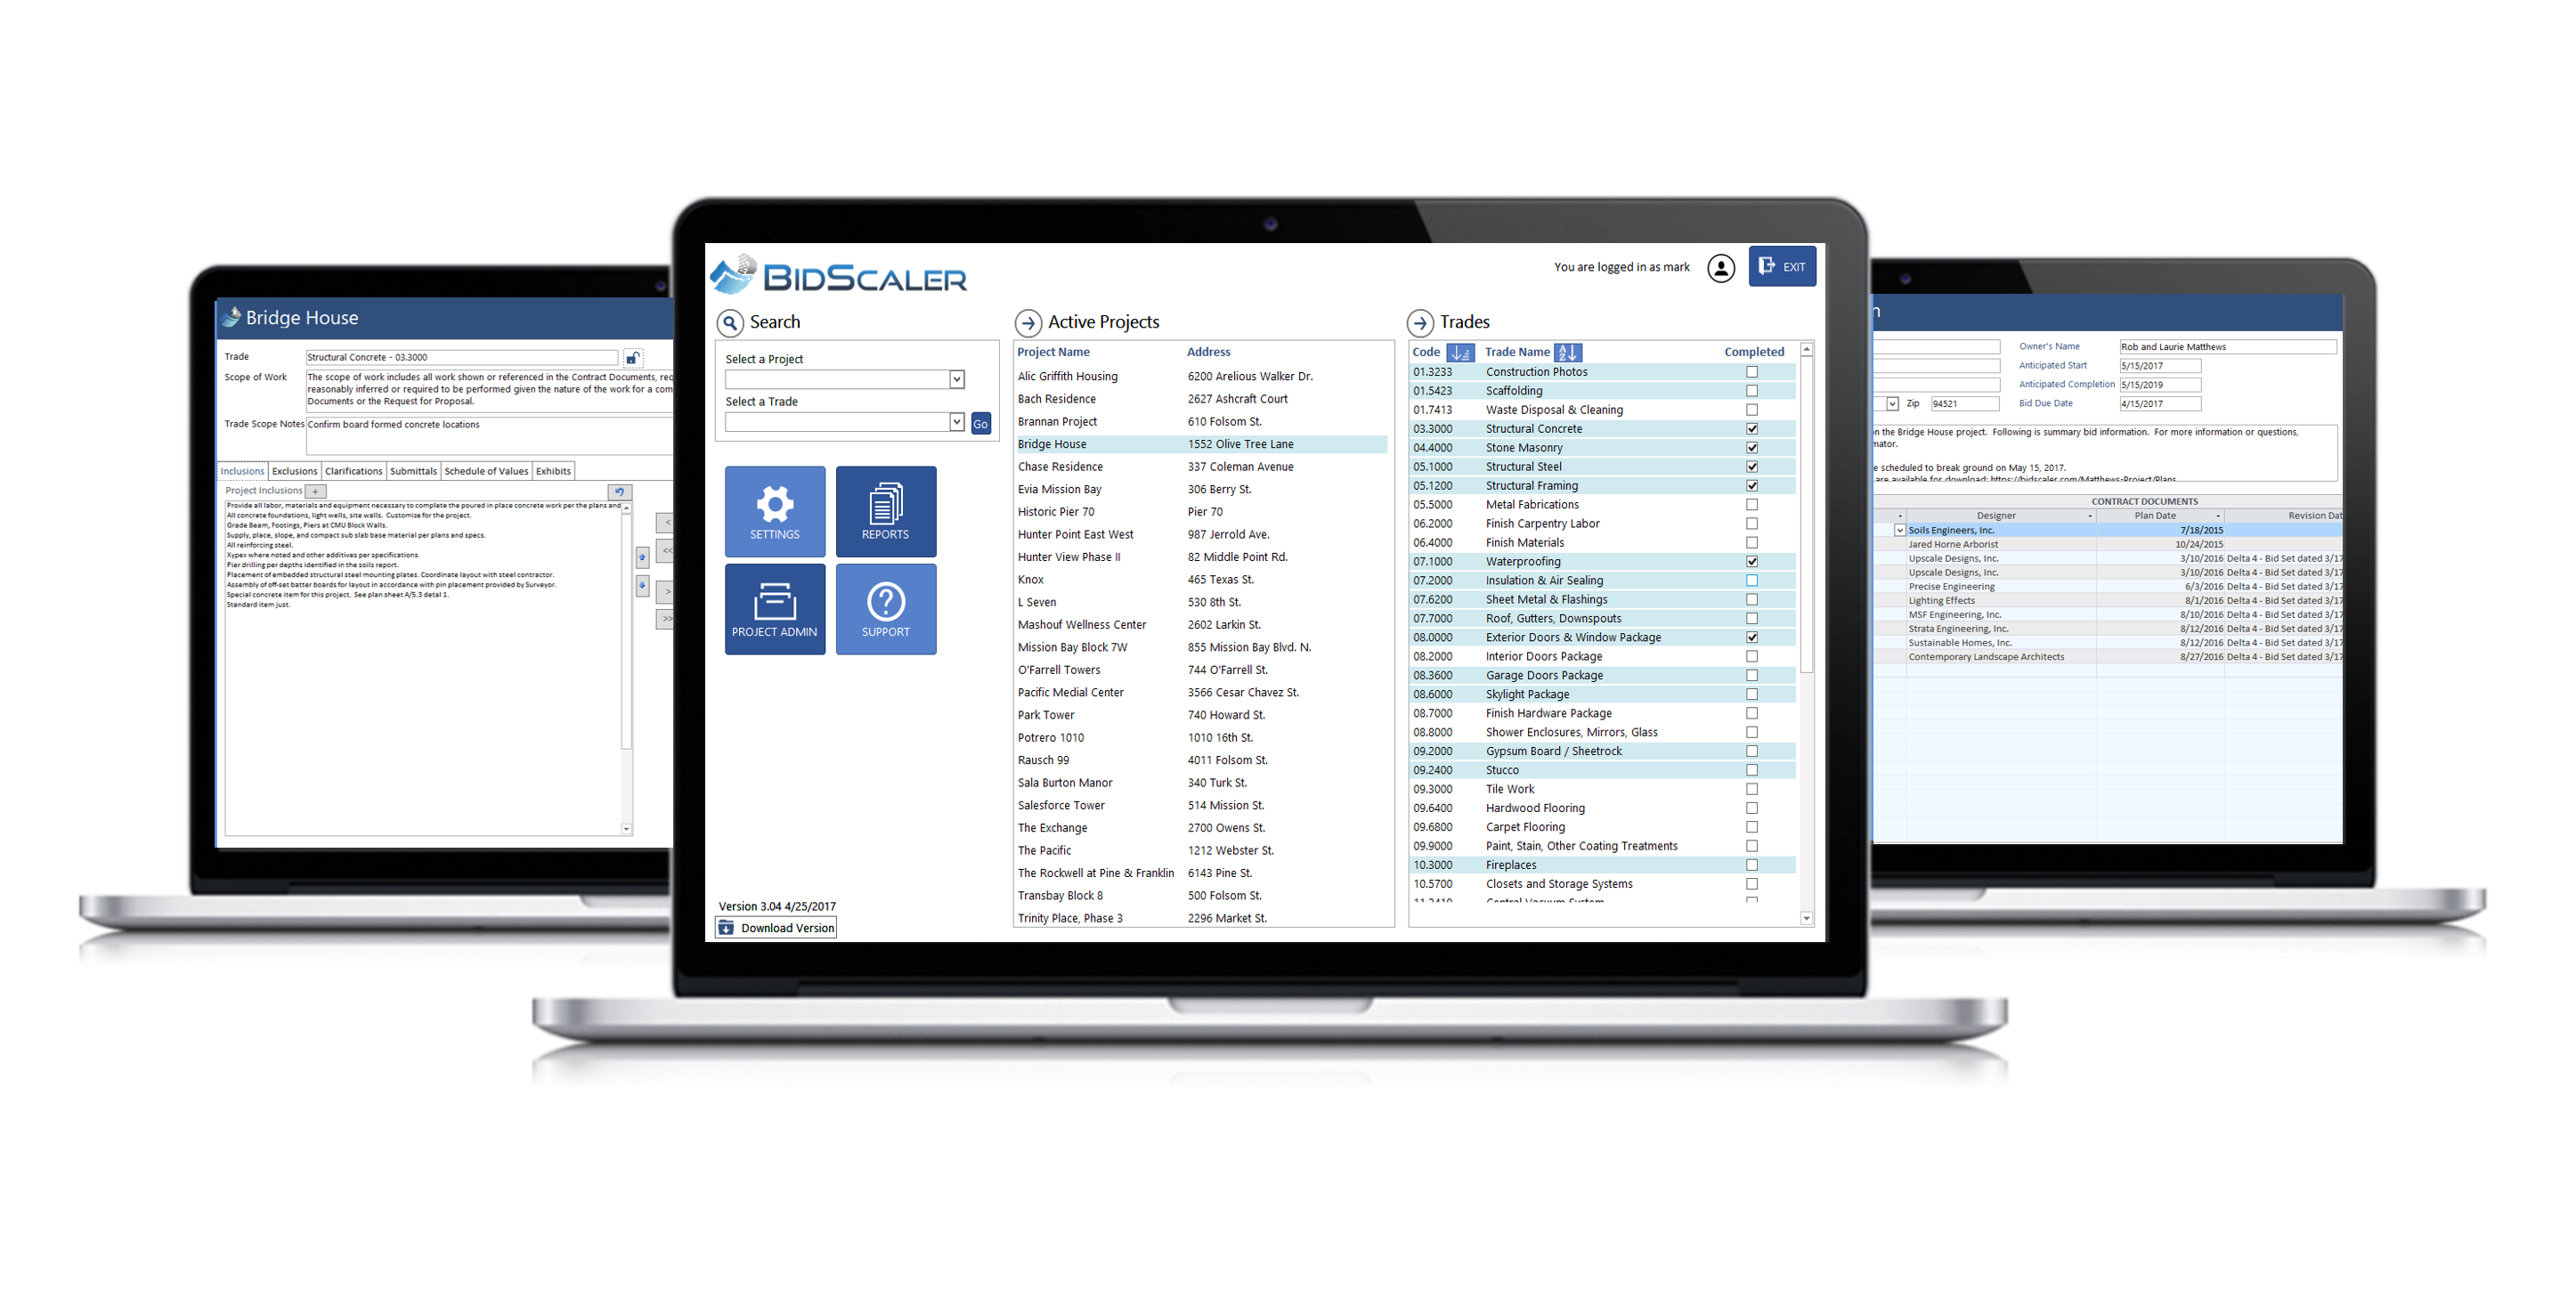 BidScaler bid instruction scope of work software